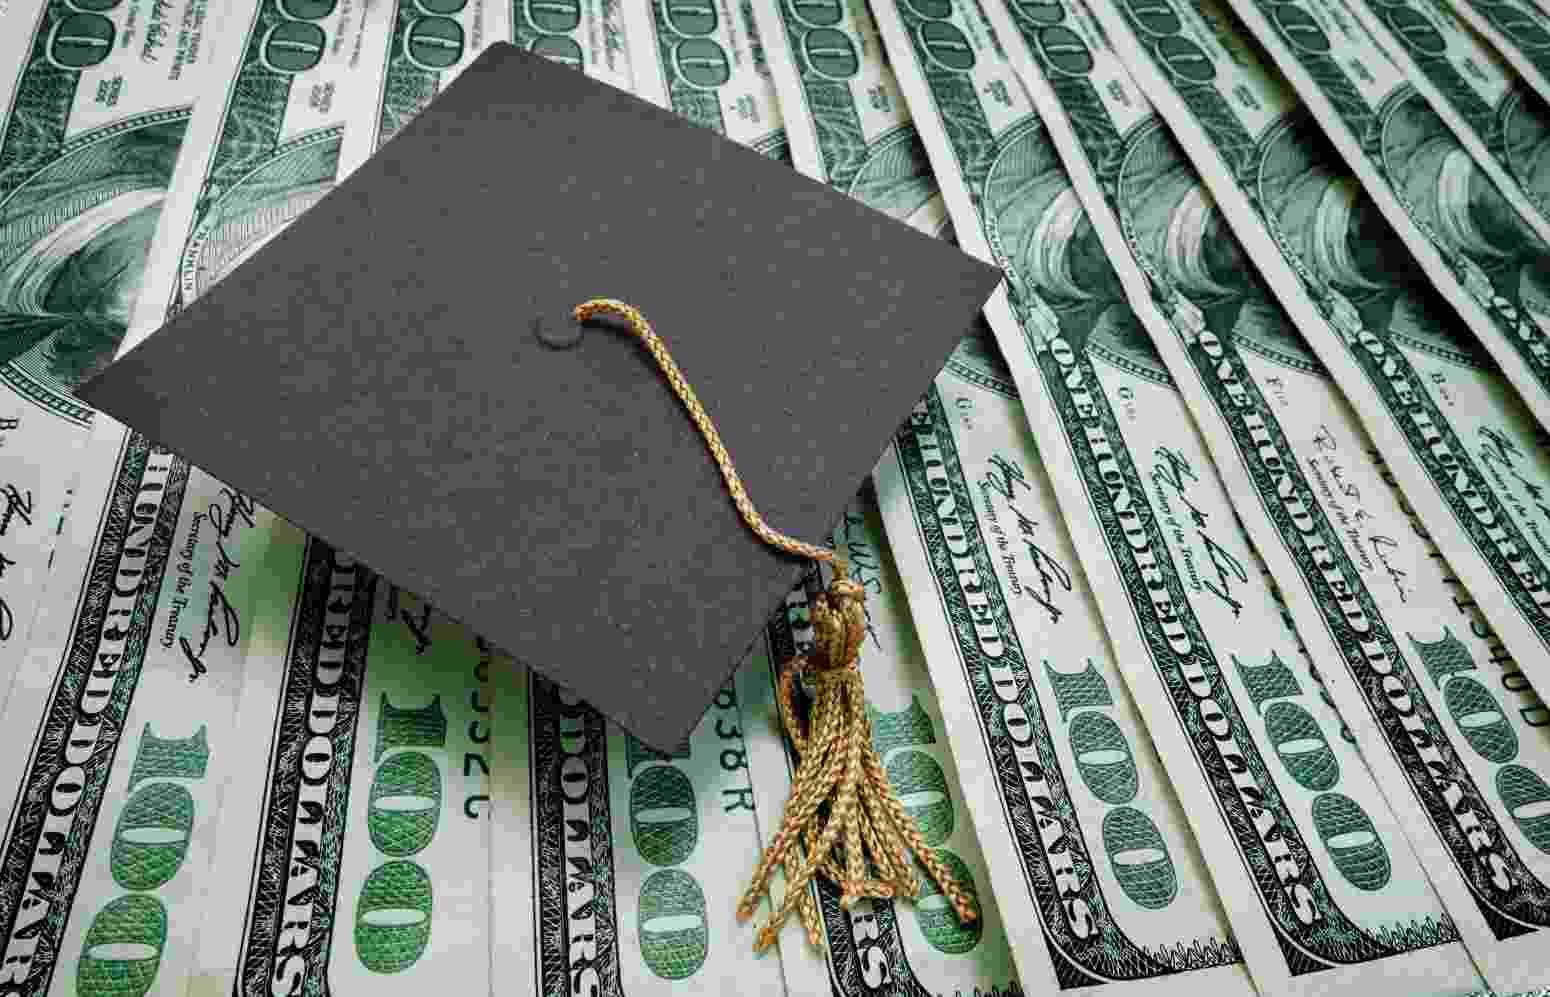 Stanford endowment achieves 13 1% one-year return